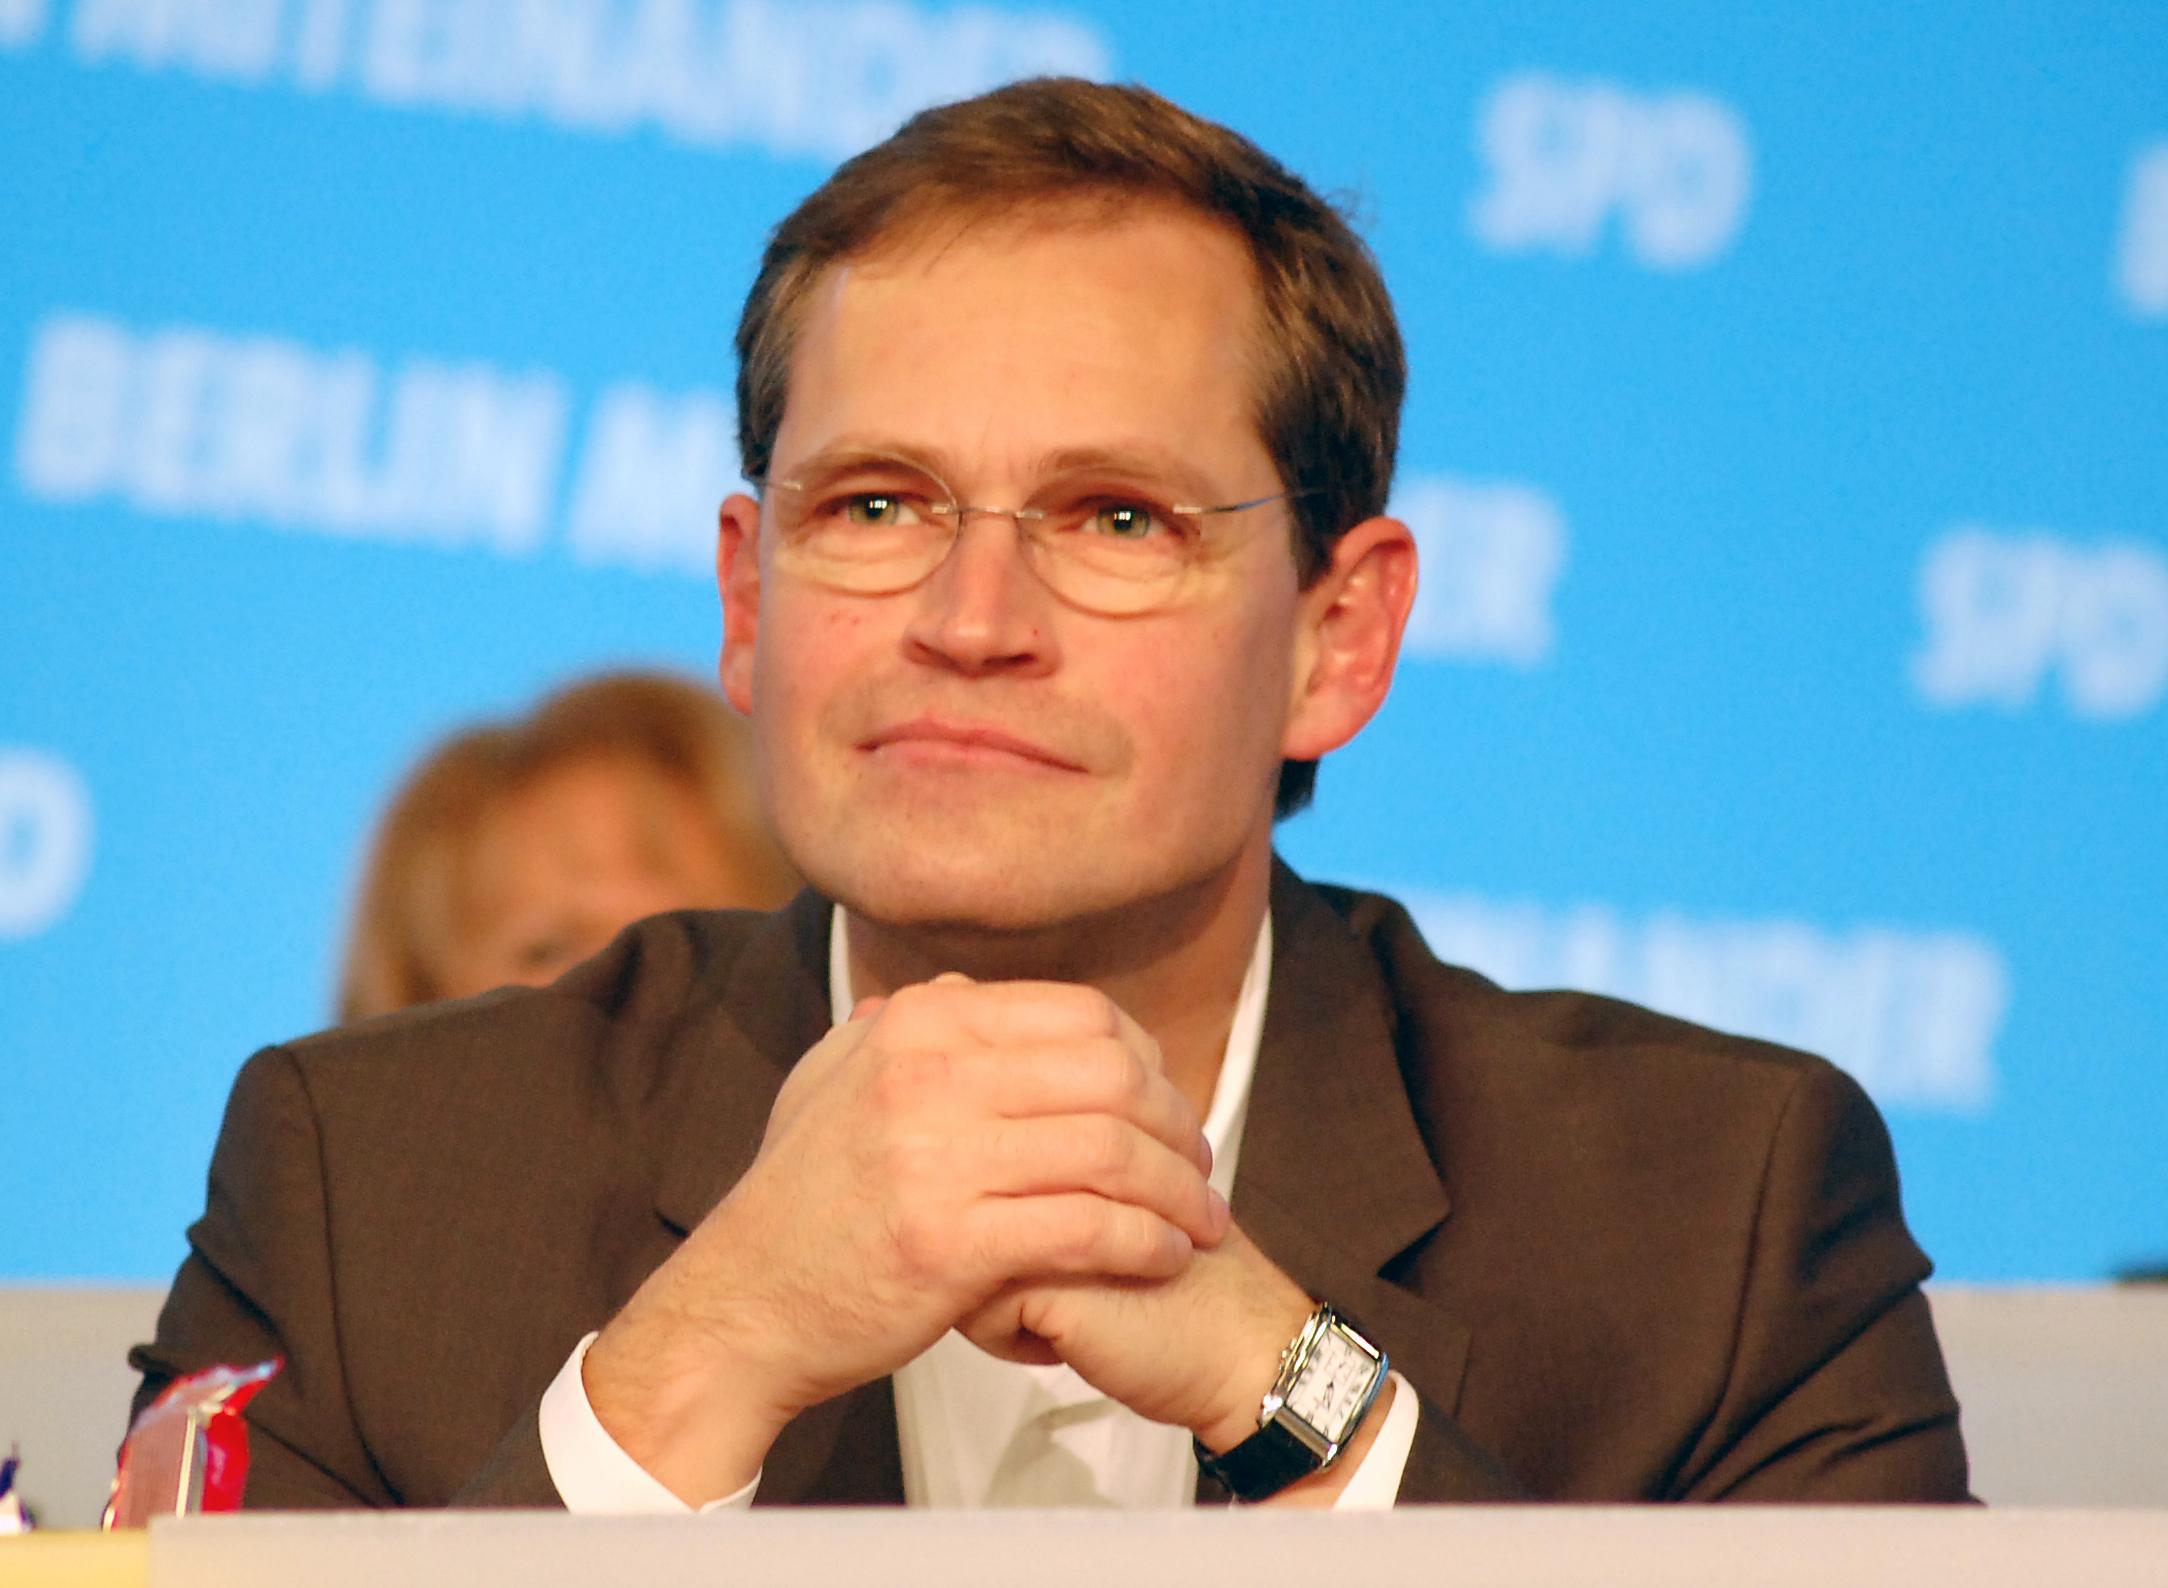 Der Regierende Bürgermeister Michael Müller, SPD